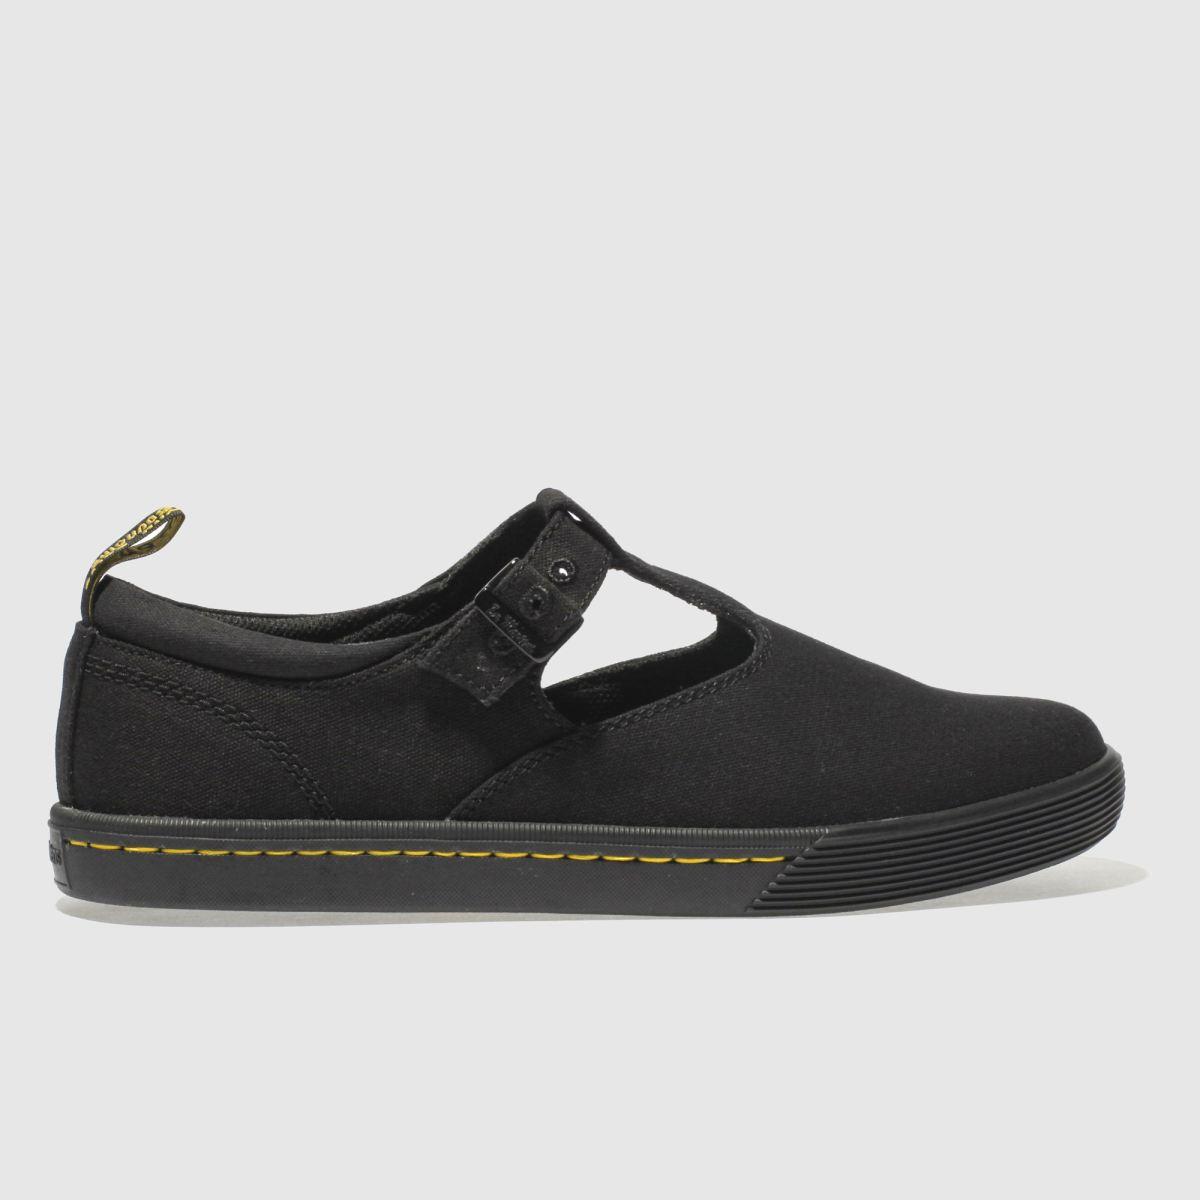 Dr Martens Black Winona Flat Shoes